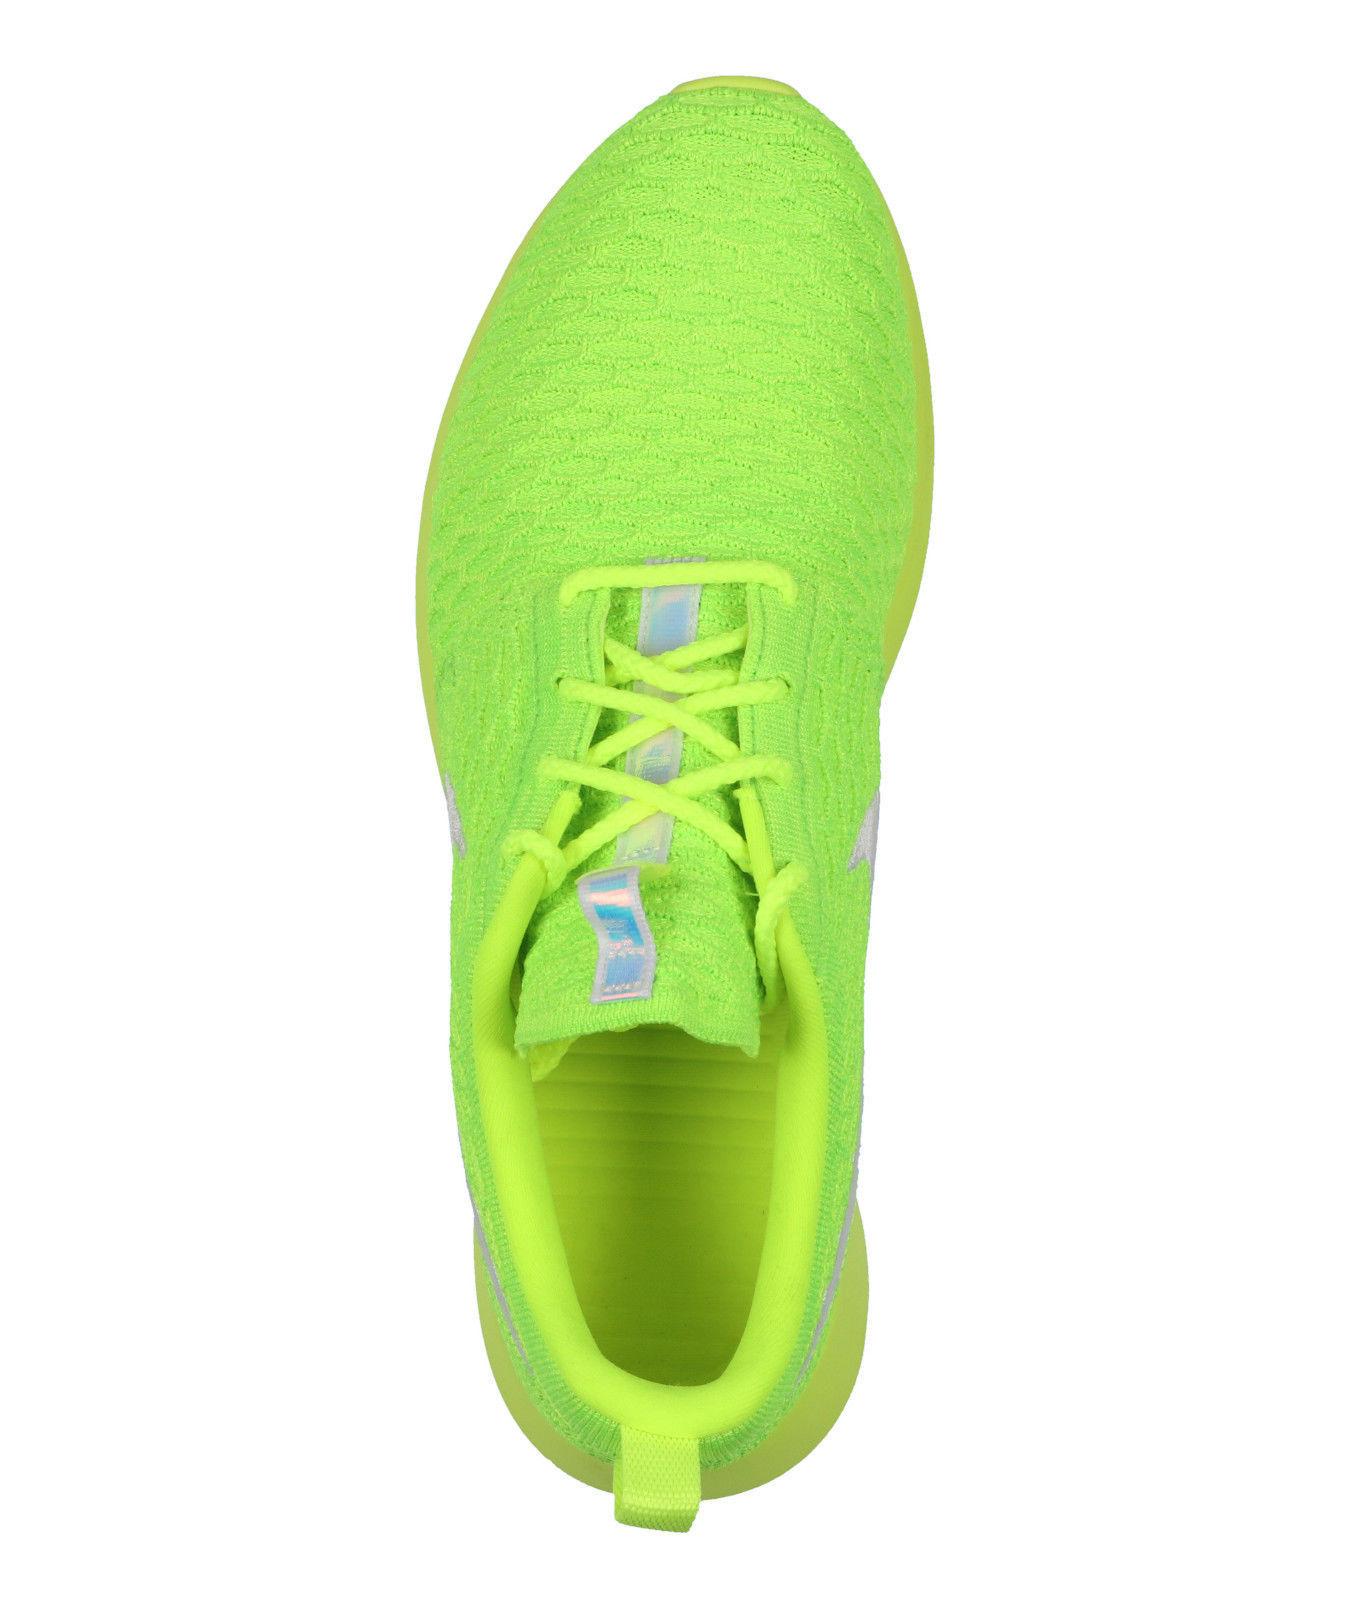 super popular 03948 8fd31 ... NIKE Roshe NM Flyknit sz 10 Volt White Electric Green Rosherun Tennis  Ball ...